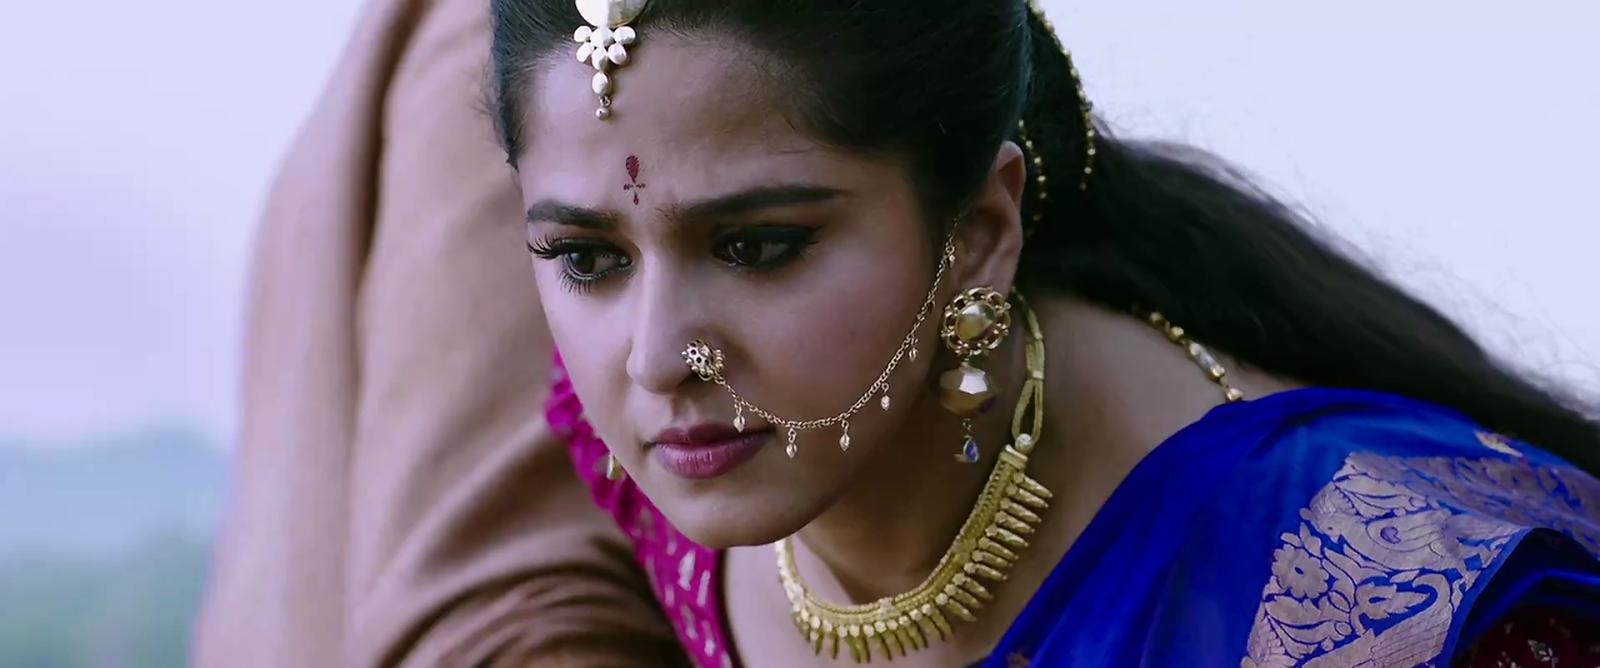 Bahubali 2 2017 1440p (2 GB) - HD Only Movies on Demand